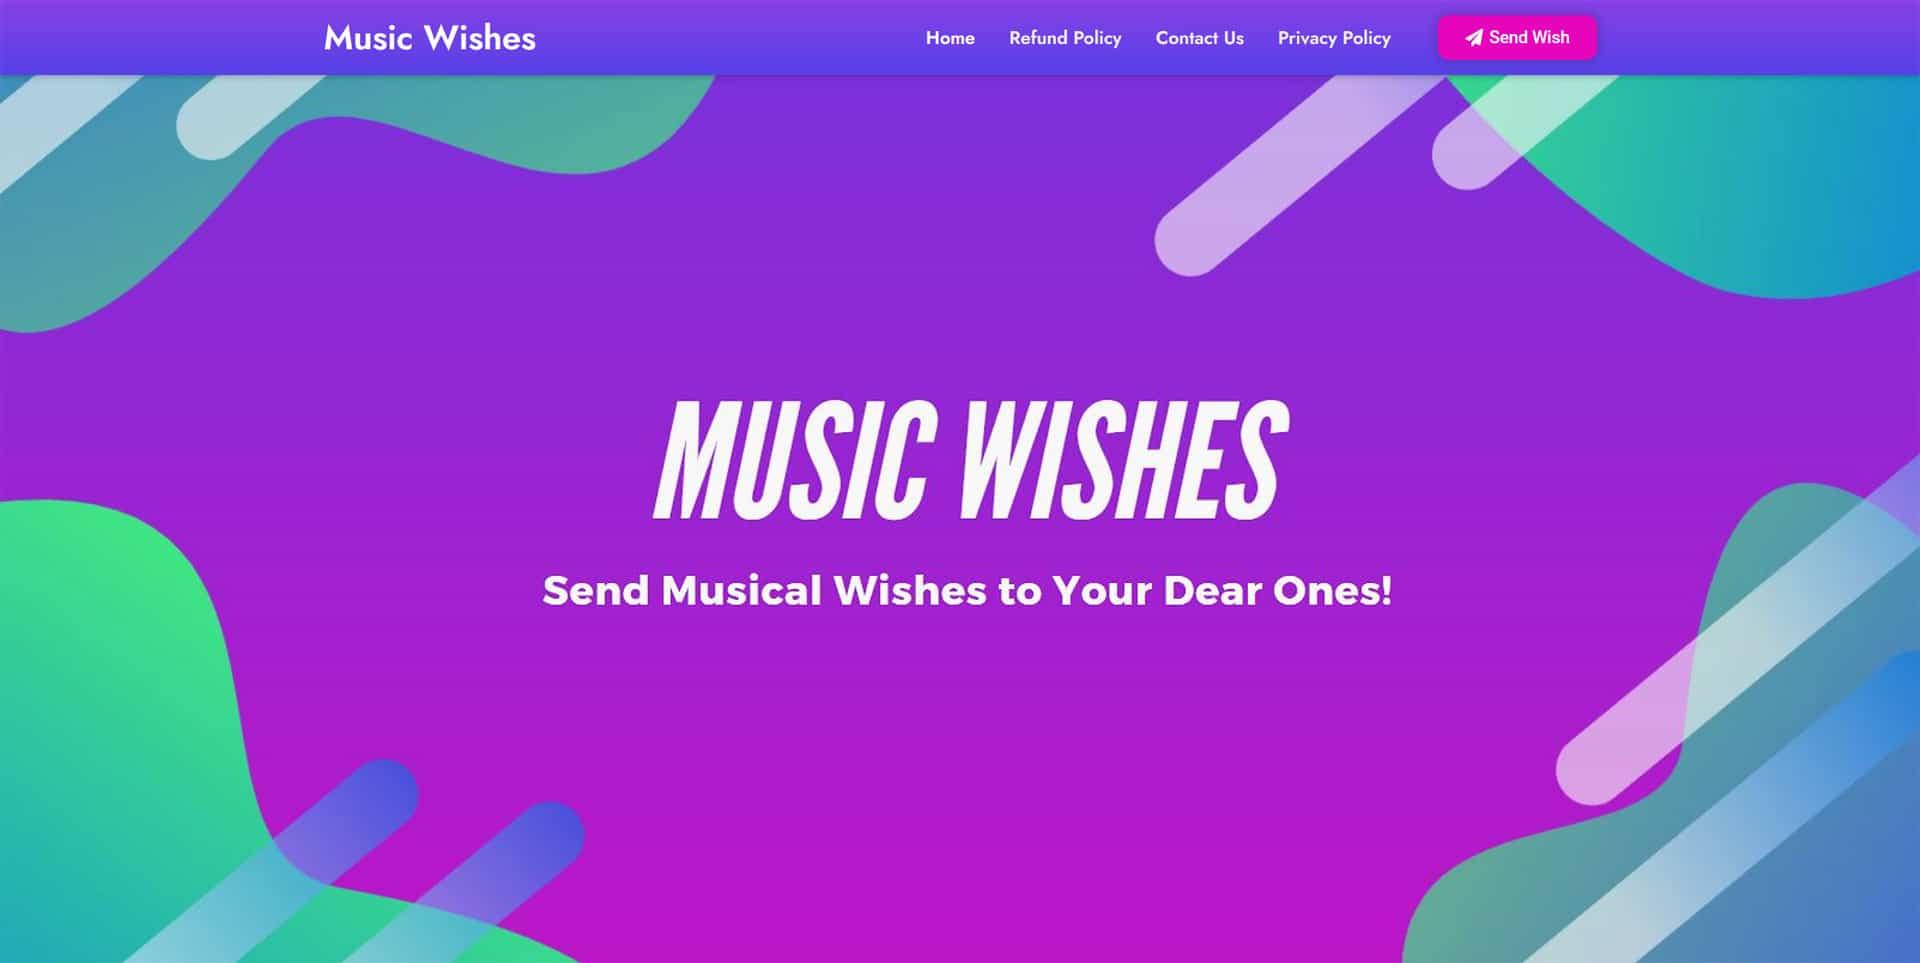 Music Wishes Website